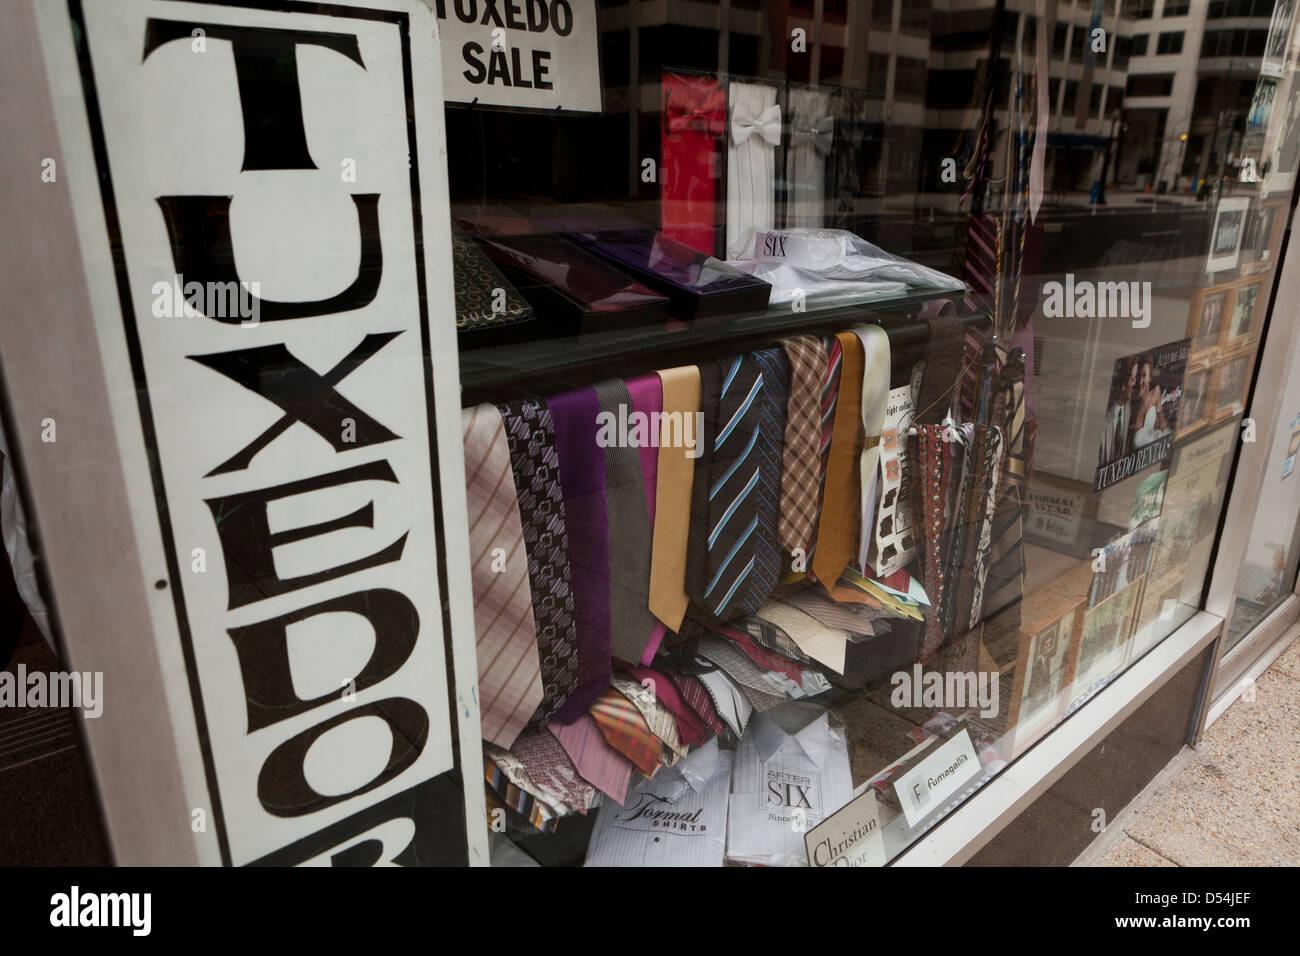 Tuxedo store window display - USA - Stock Image